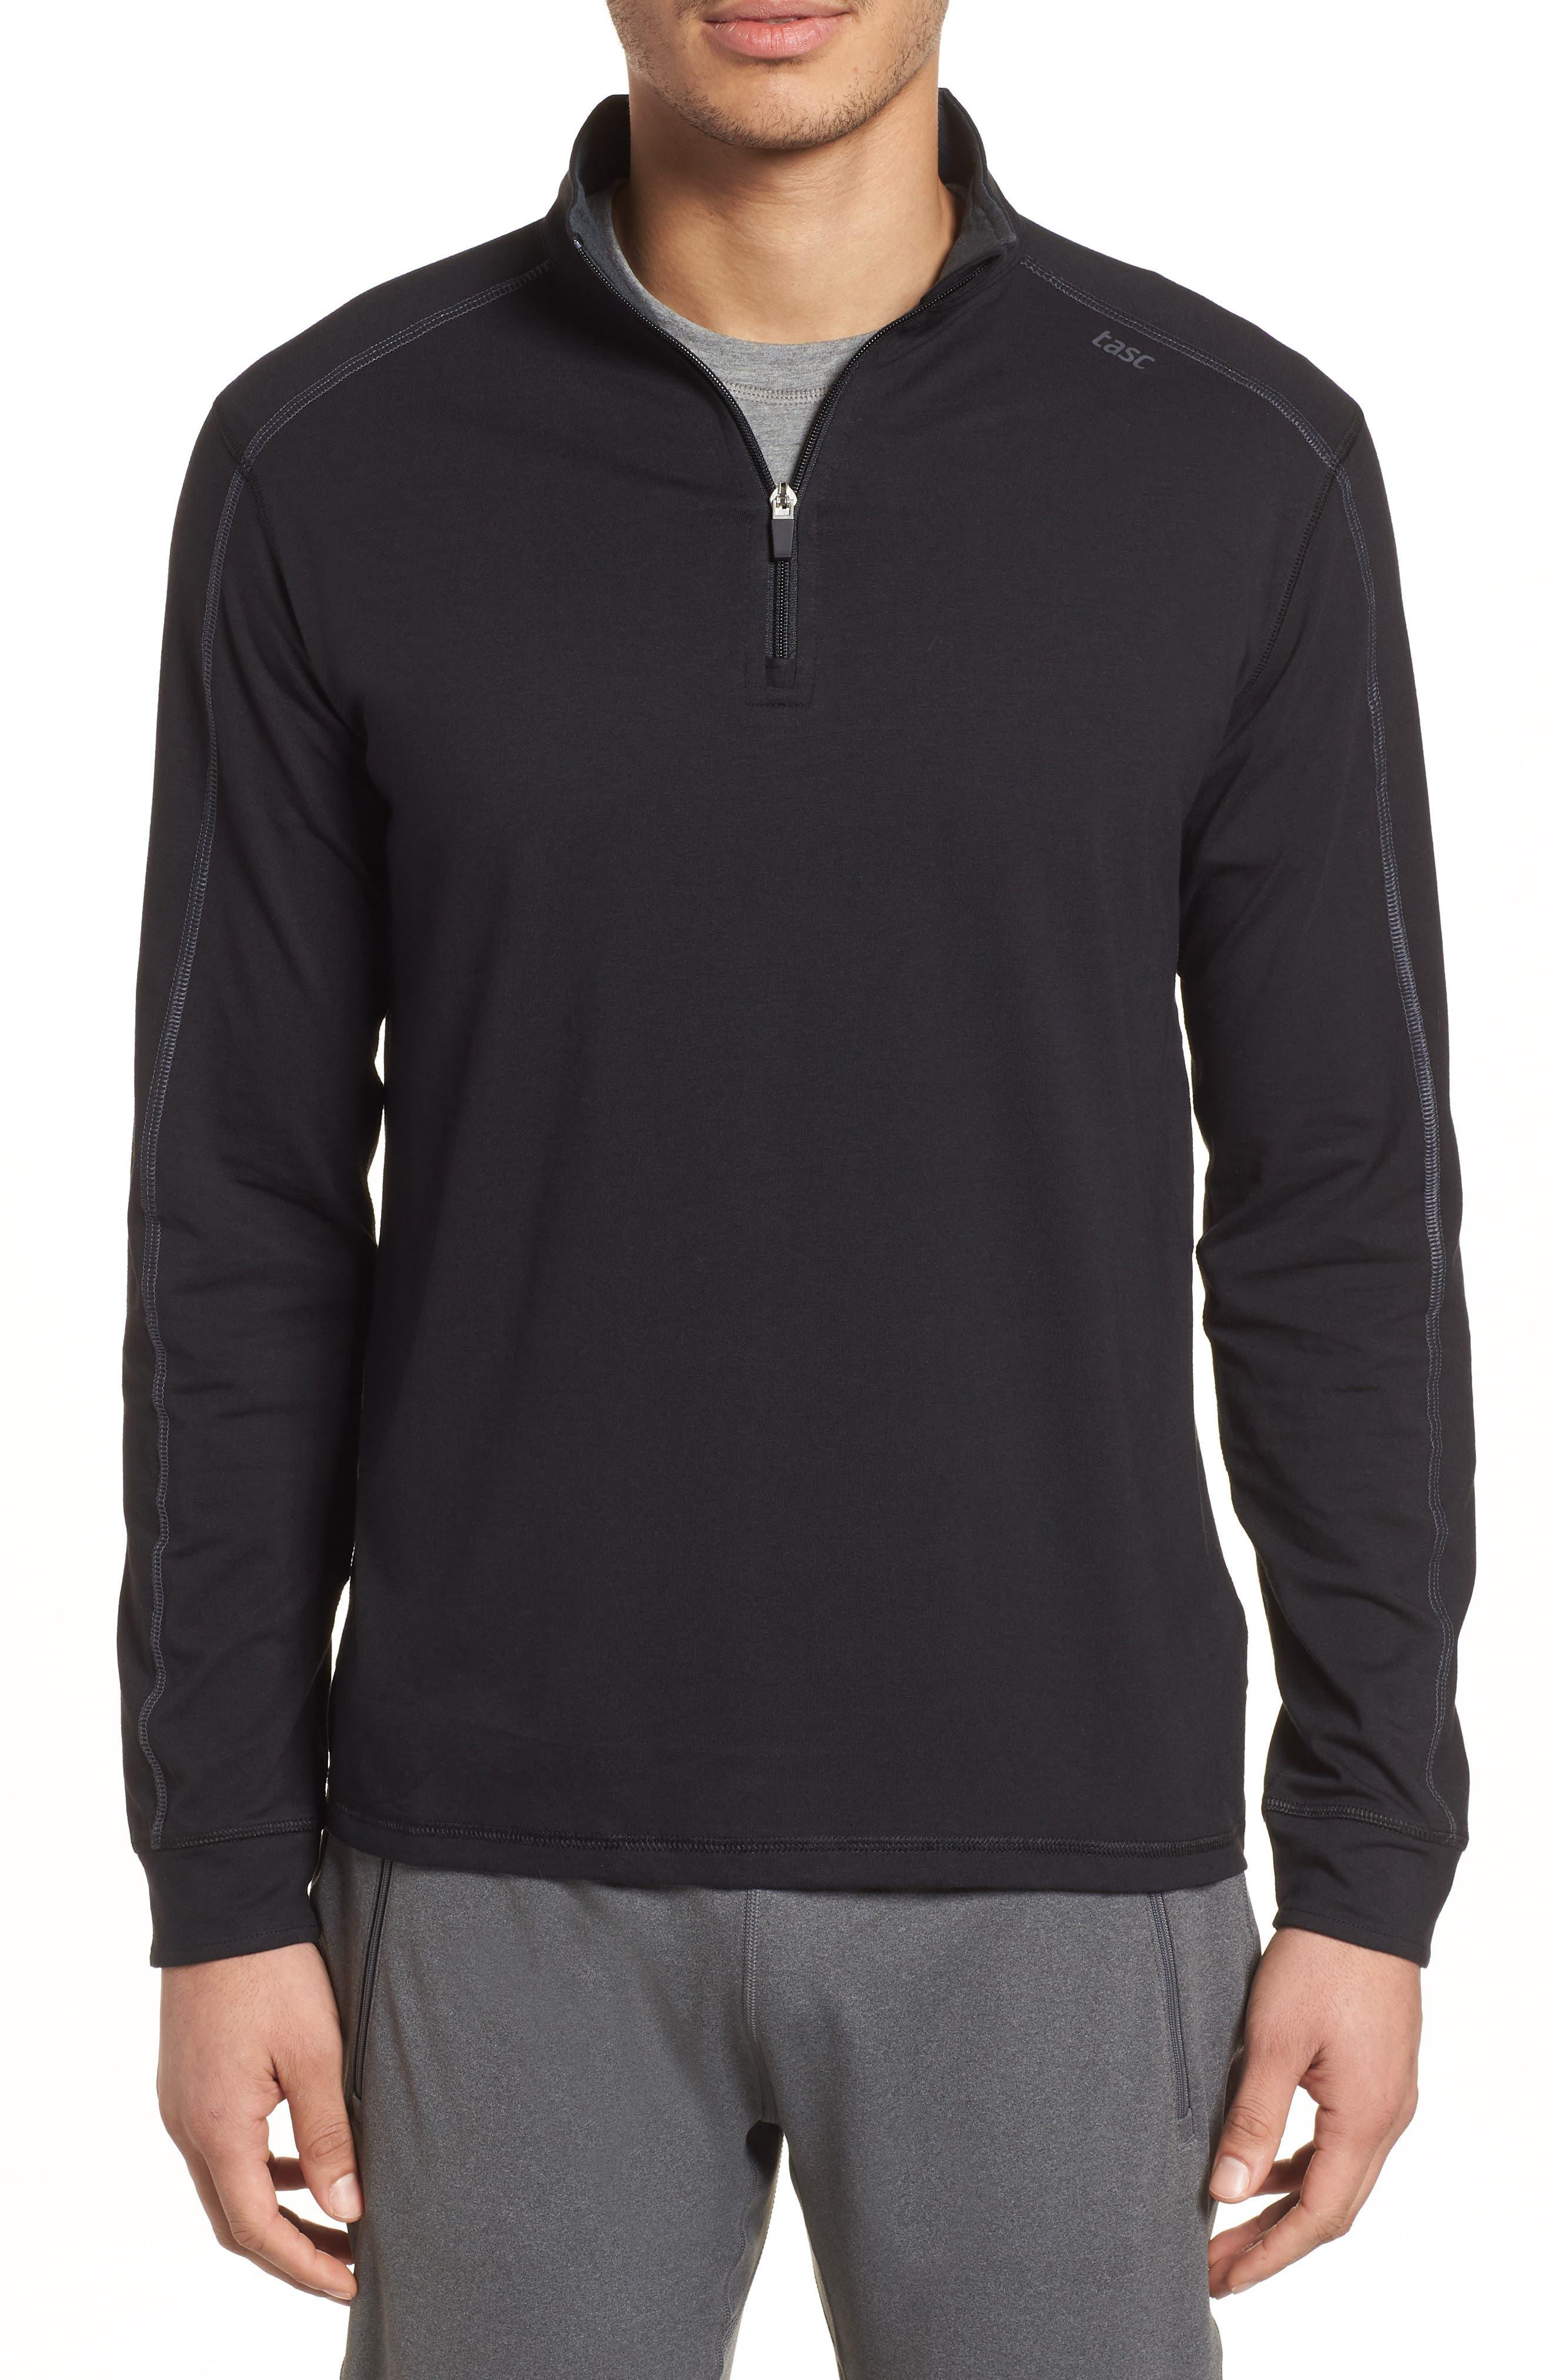 Carrollton Quarter Zip Sweatshirt,                             Main thumbnail 1, color,                             BLACK/ GUNMETAL